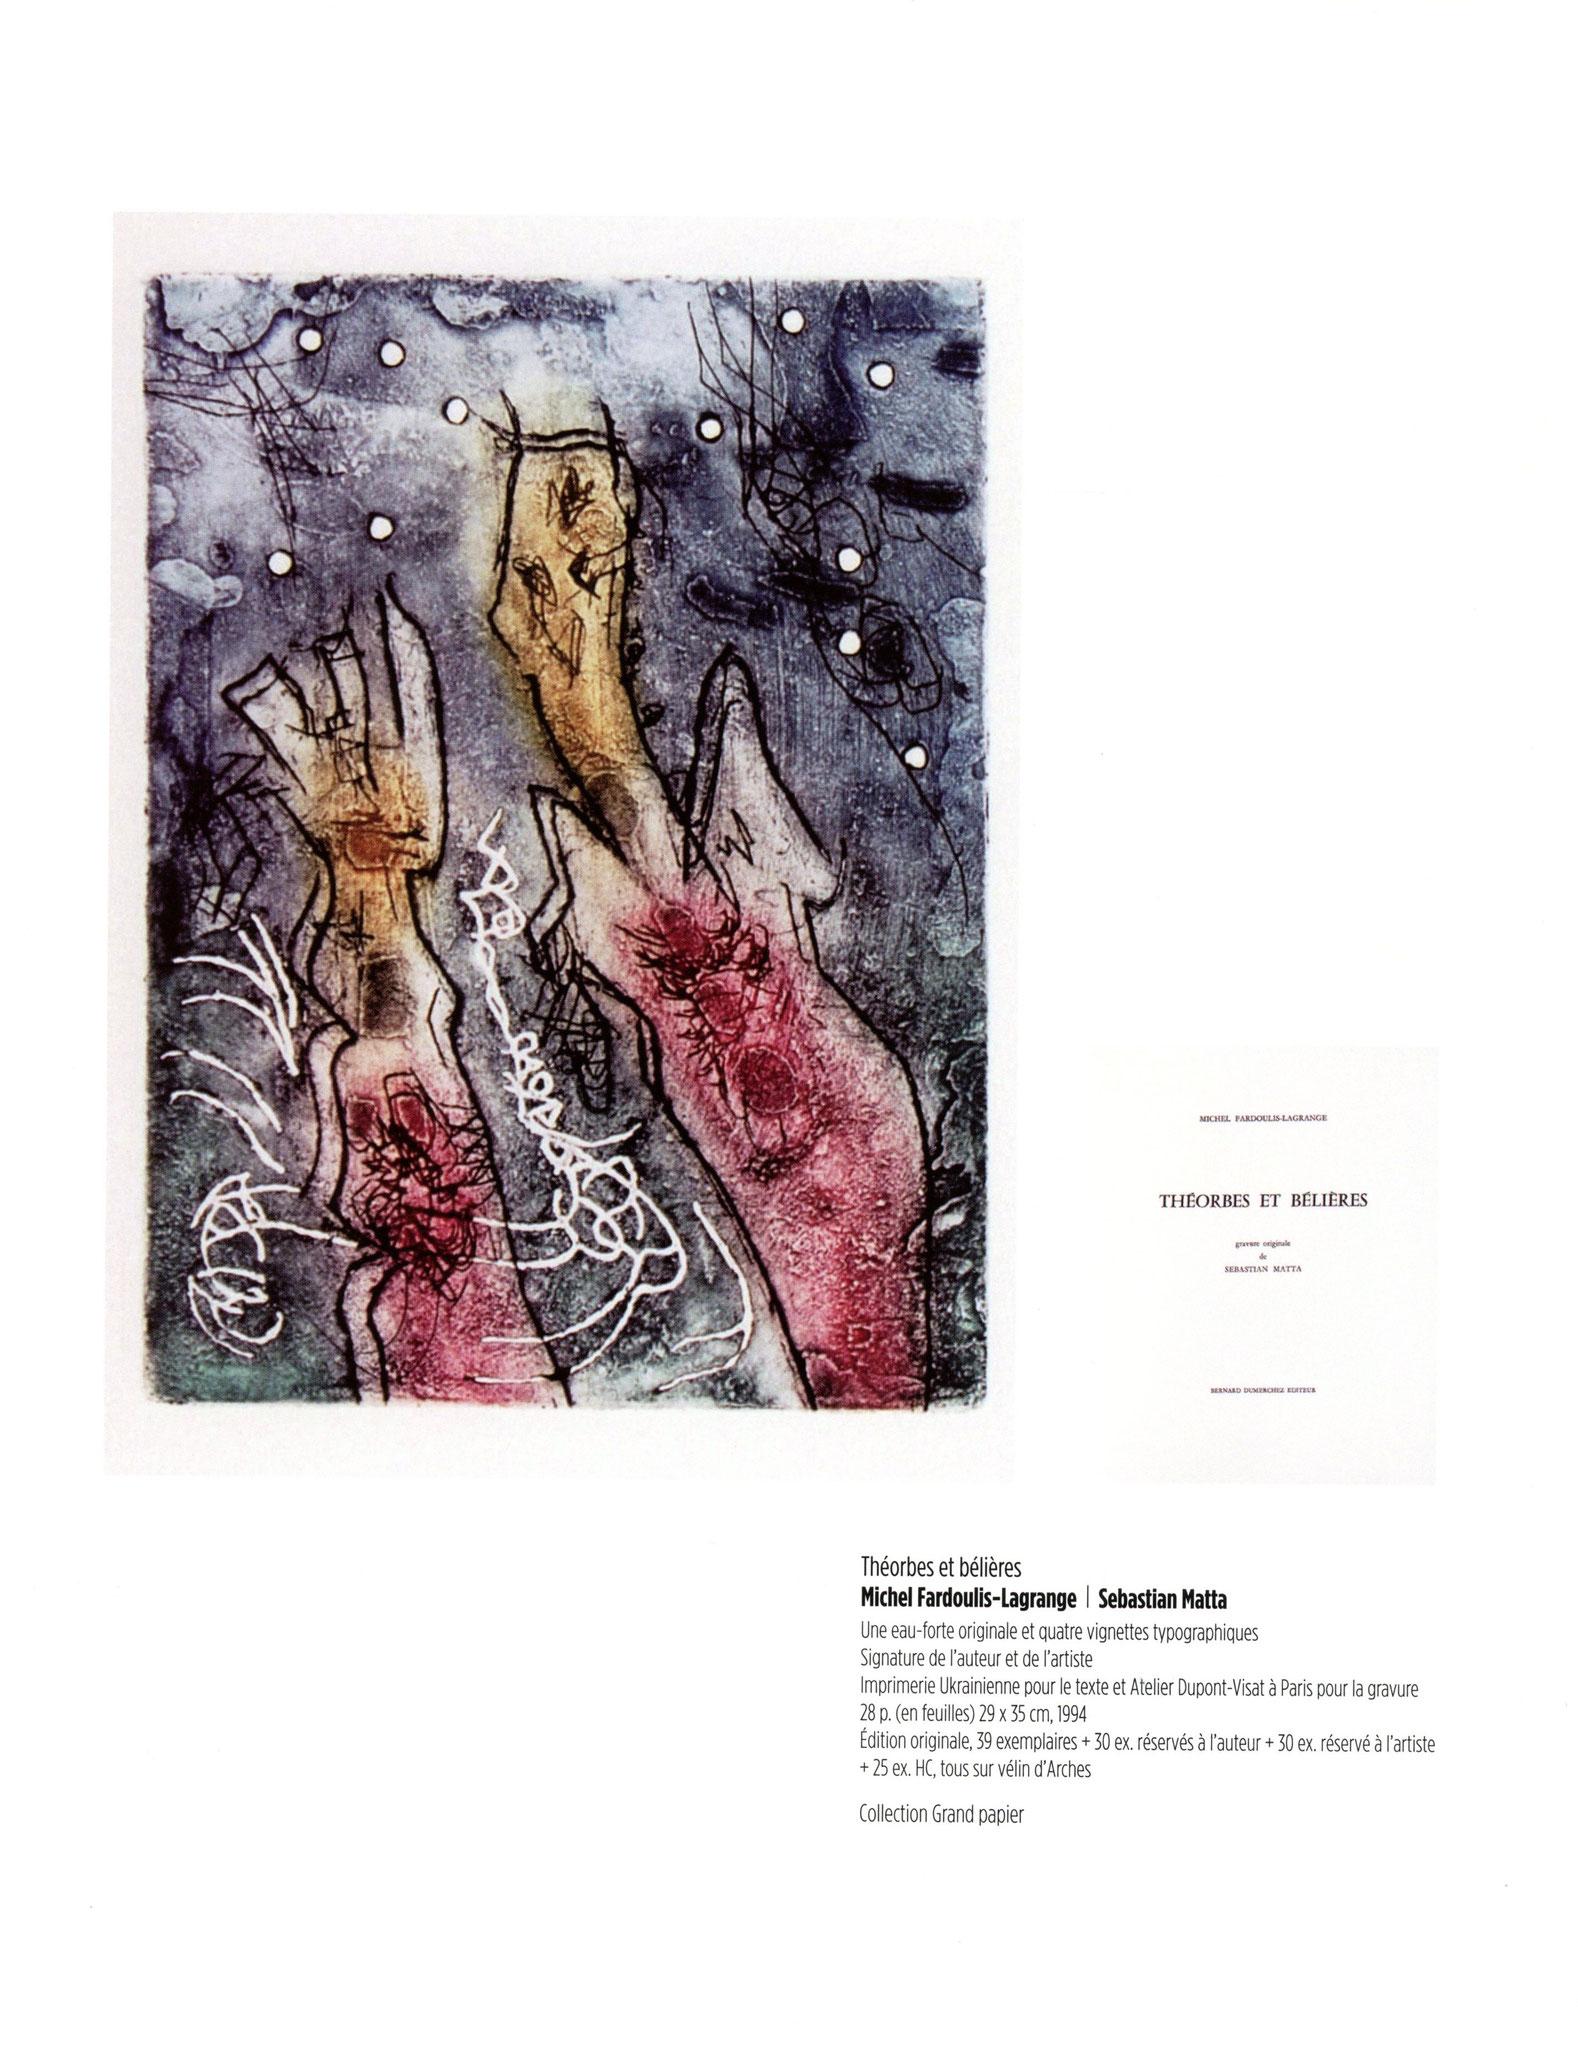 Théorbes et bélières - Michel Fardoulis-Lagrange / Sebastian Matta